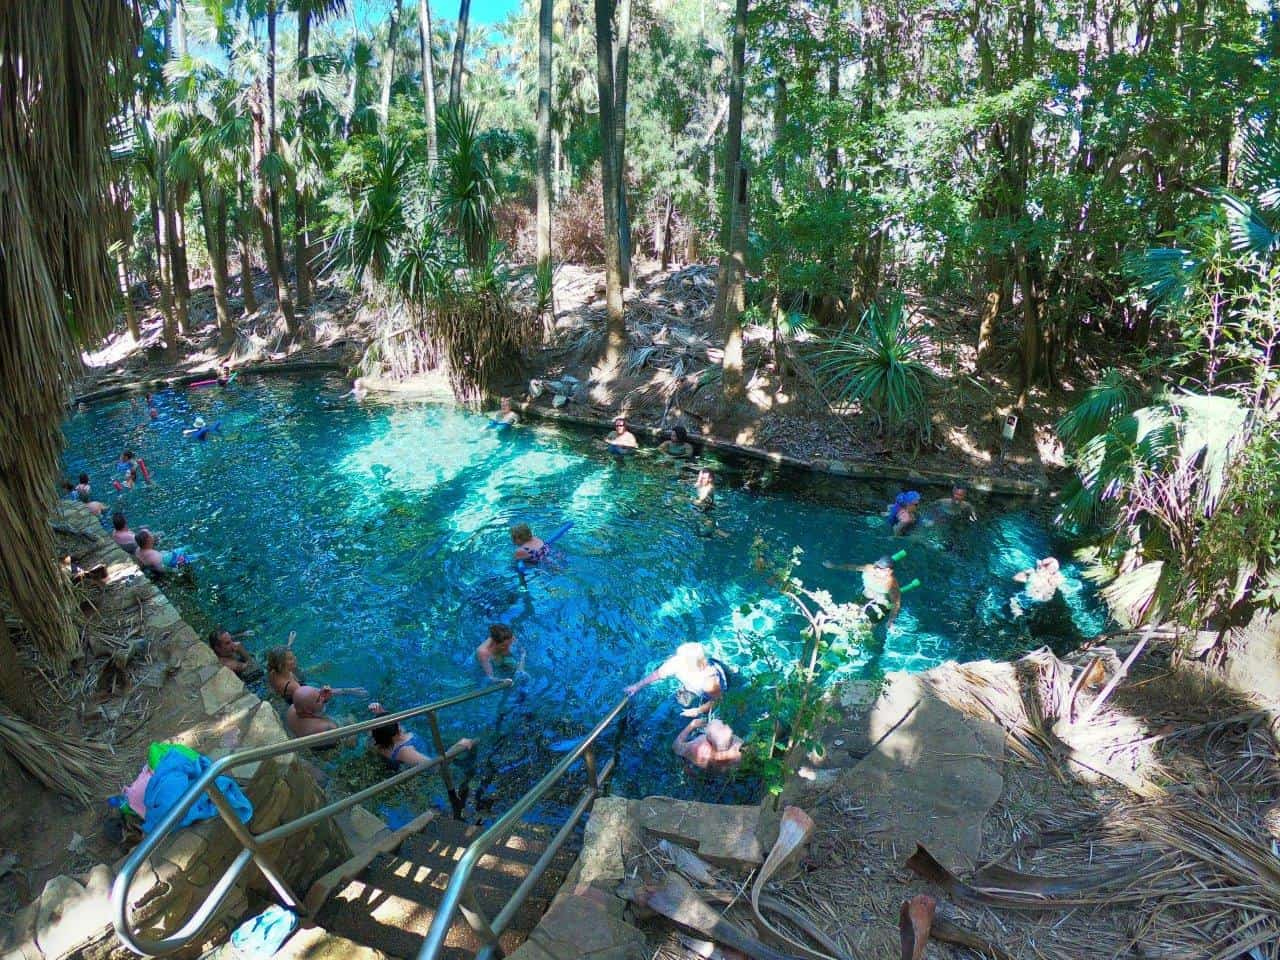 Busy thermal springs